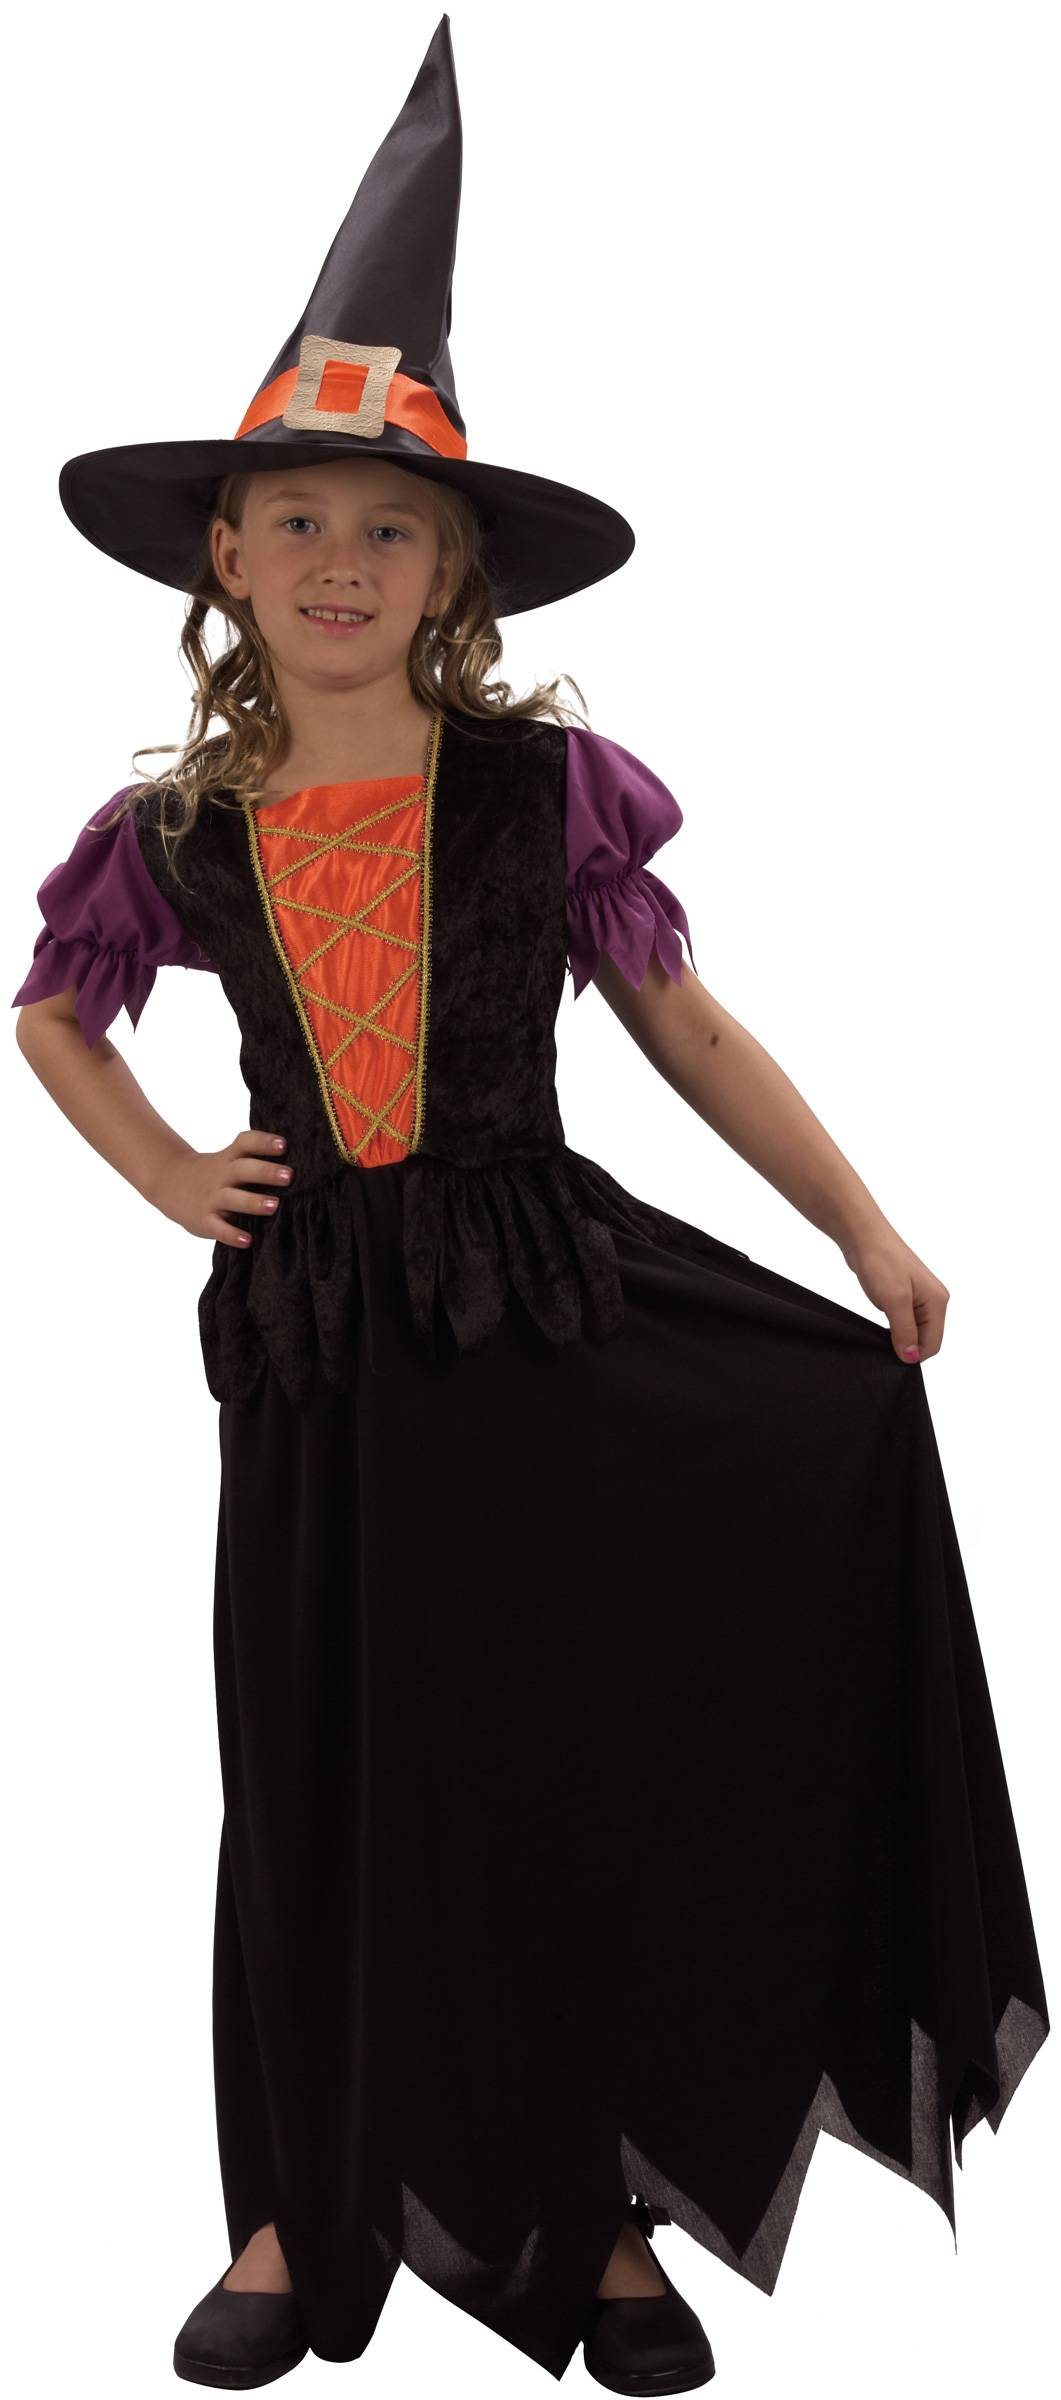 Vegaoo Stygga Stina - Häxdräkt för barn 104 - 116 cm (4 - 6 år)